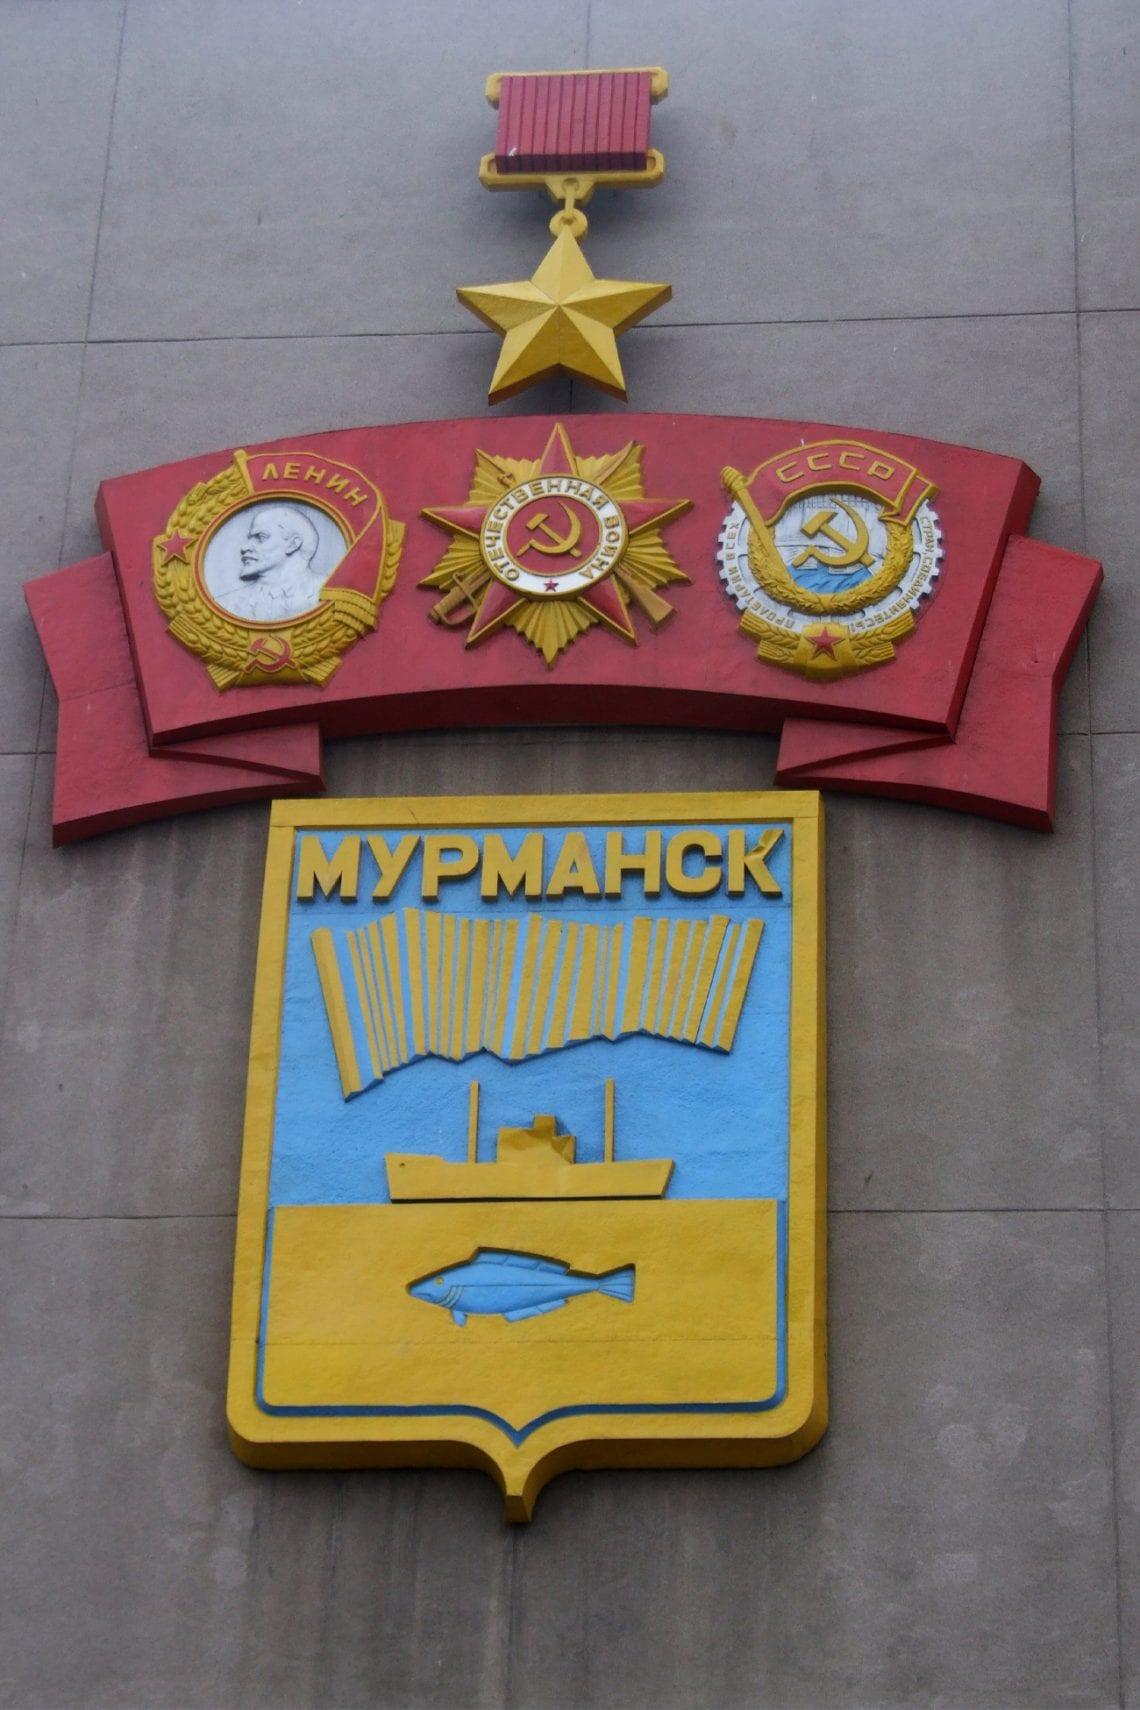 murmansk challenge city icon